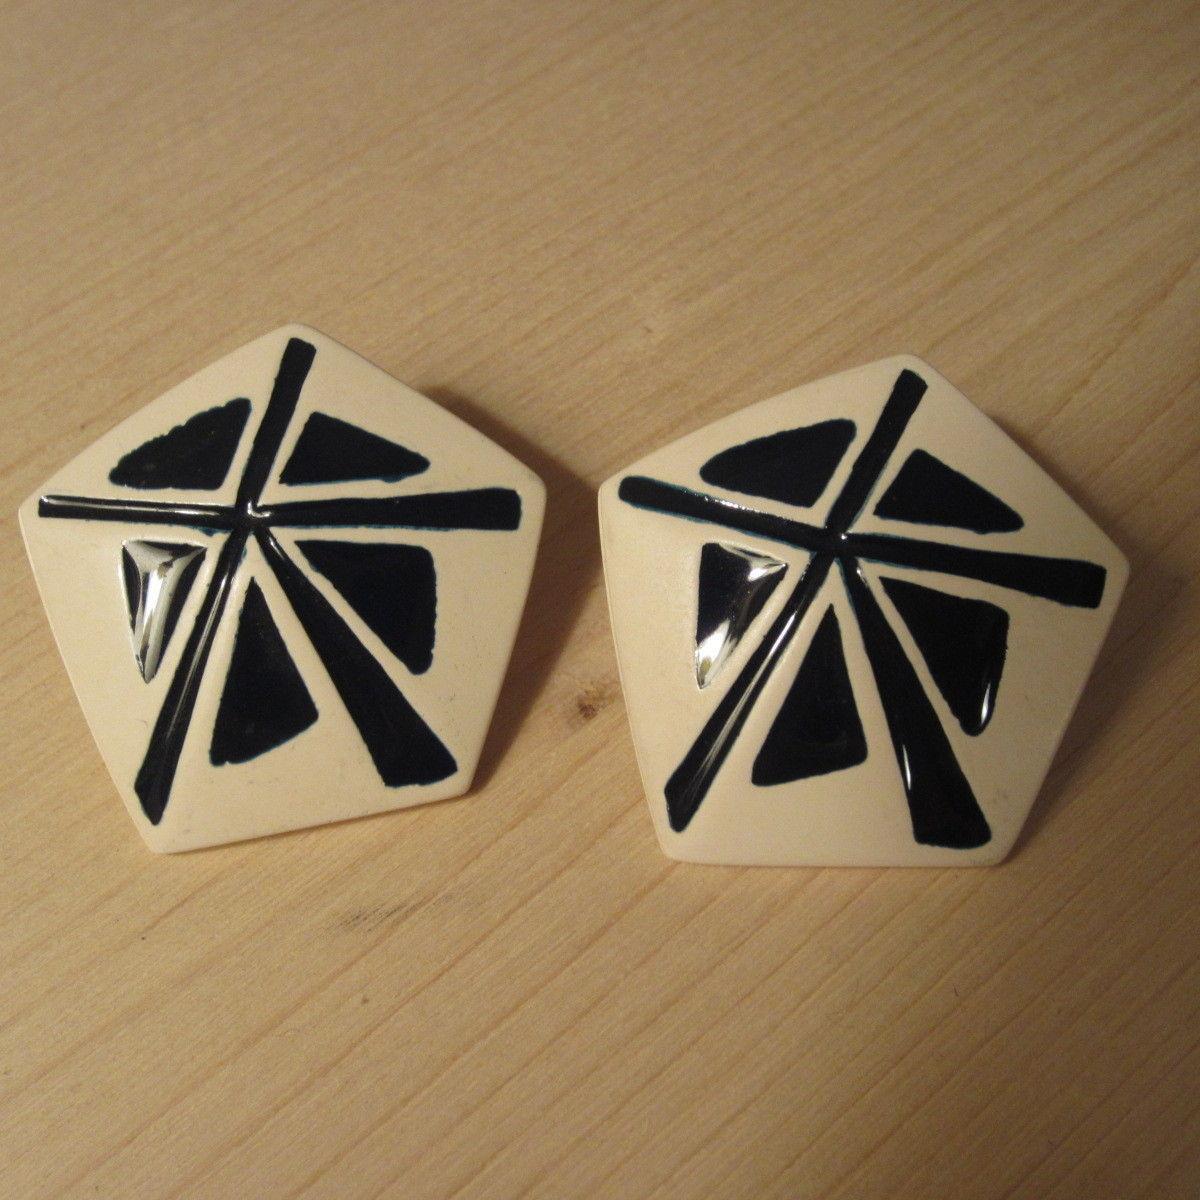 21 Geometric Earring Designs Ideas Models Design